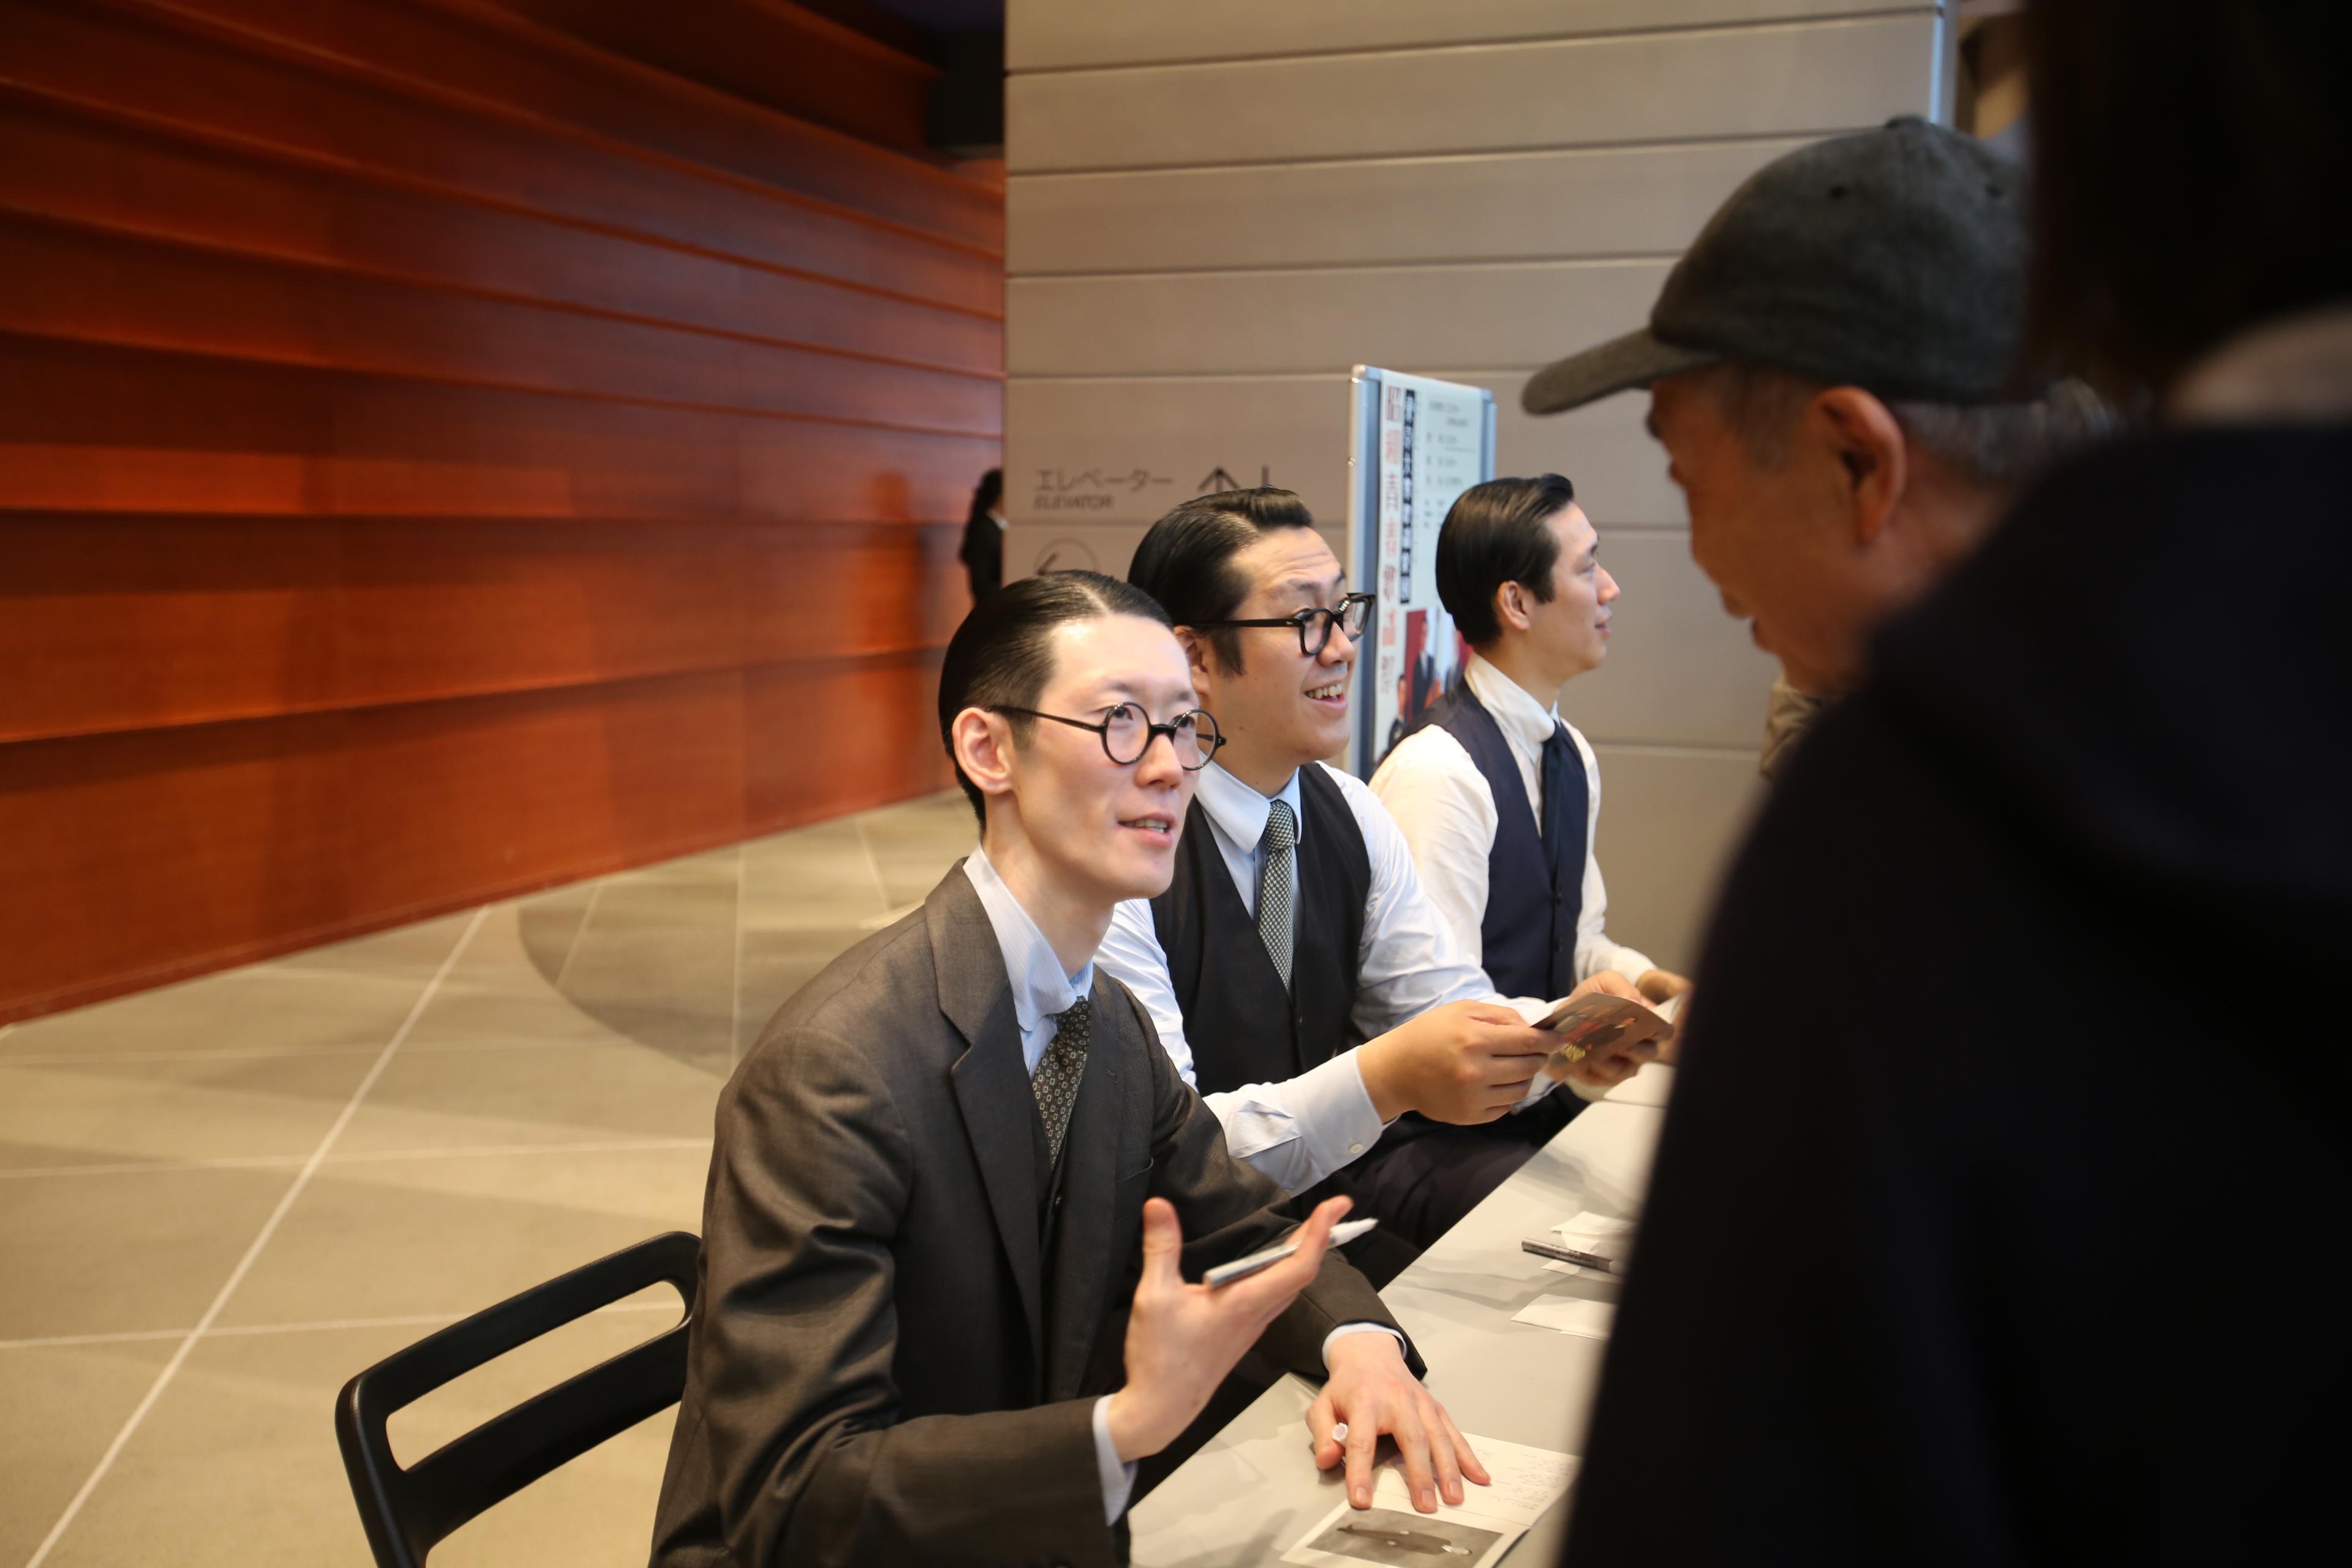 東京大衆歌謡楽団 公演後のサイン会